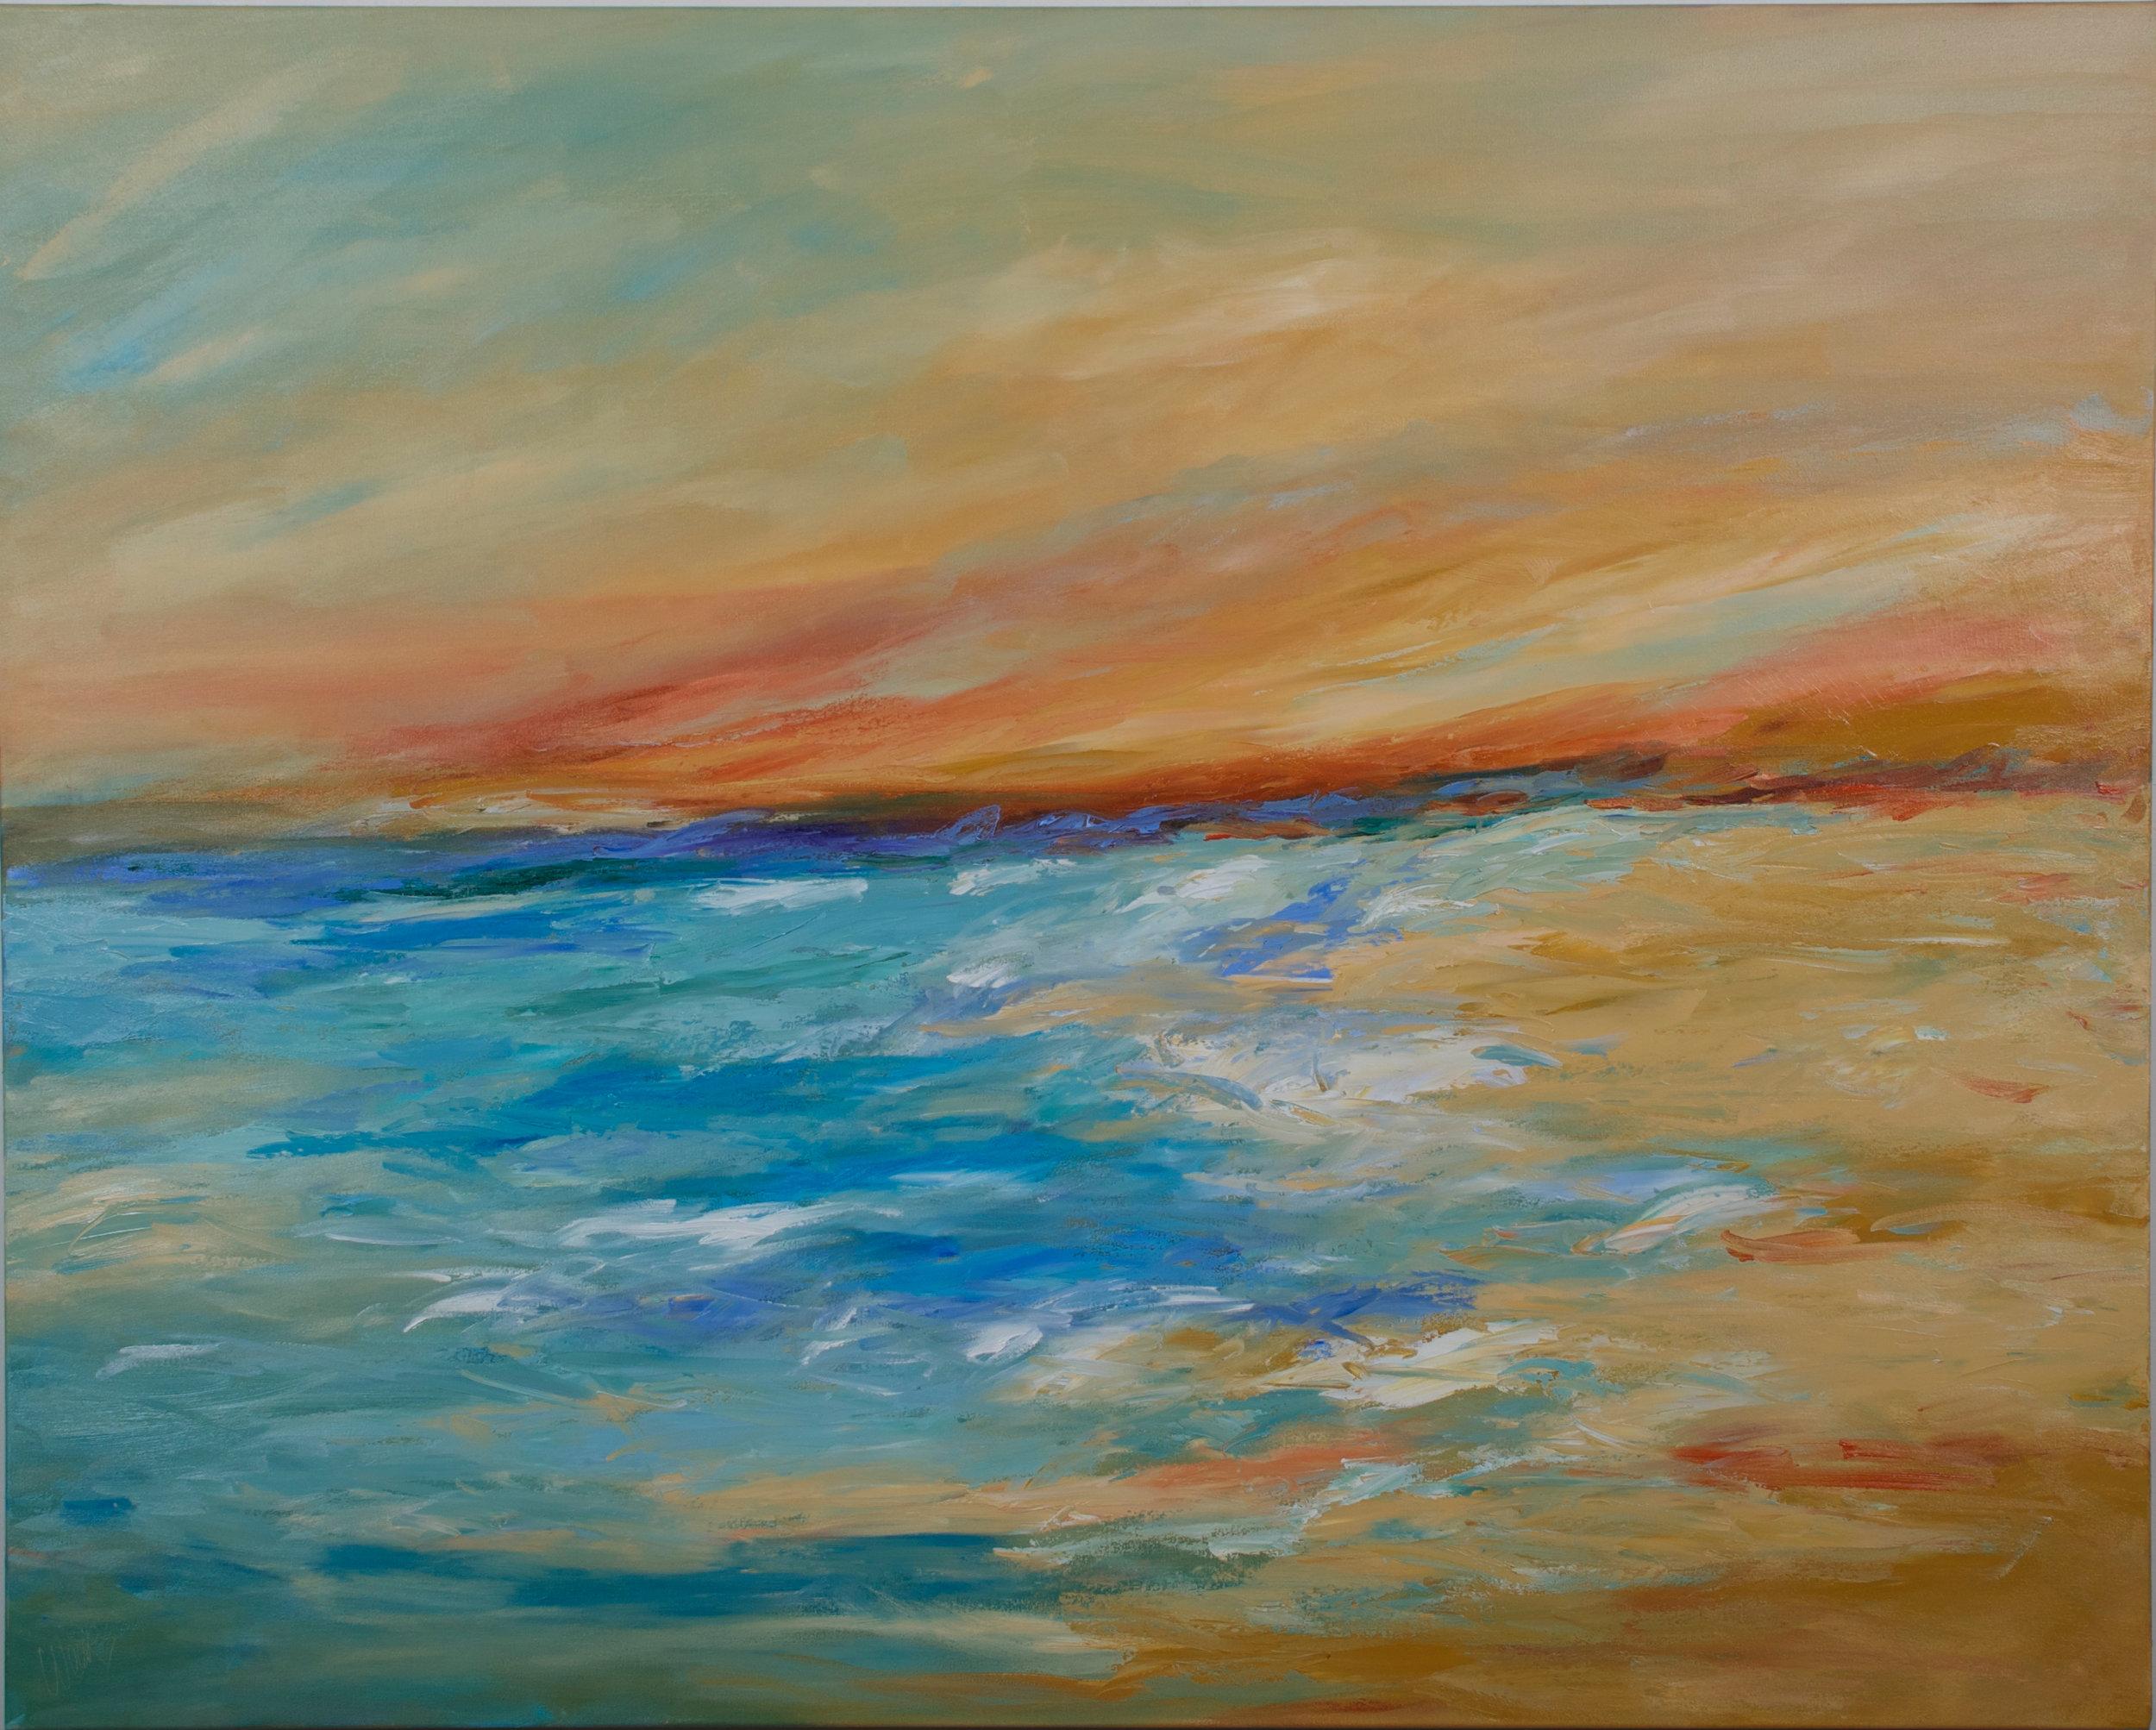 """Going Coastal"" - 48 x 60 inch"